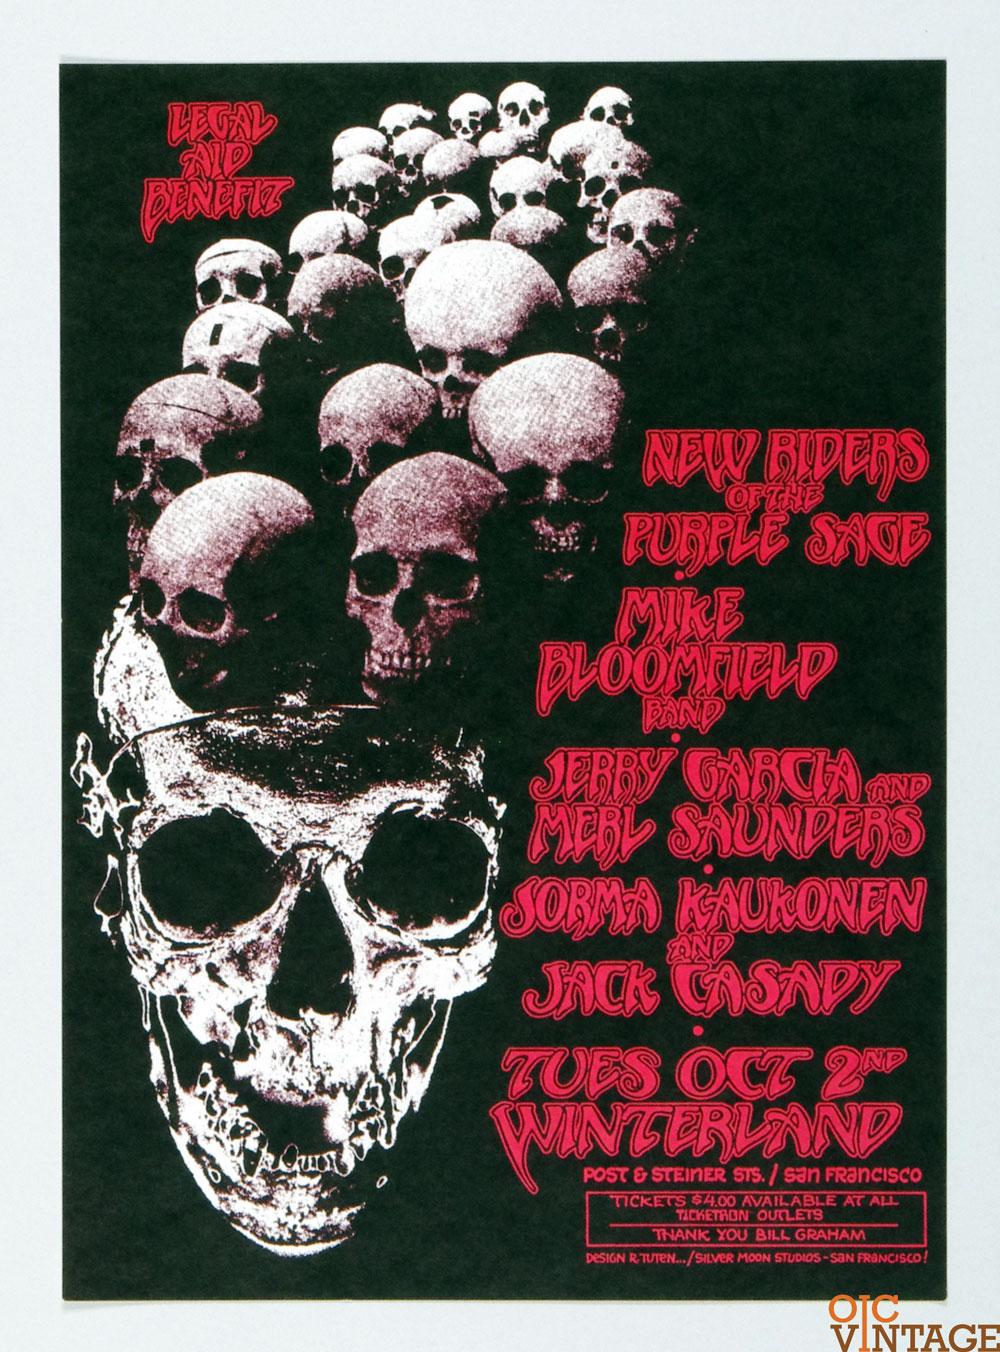 Bill Graham Legal Benefit Jerry Garcia Poster 1973 Oct 2 Winterland Randy Tuten